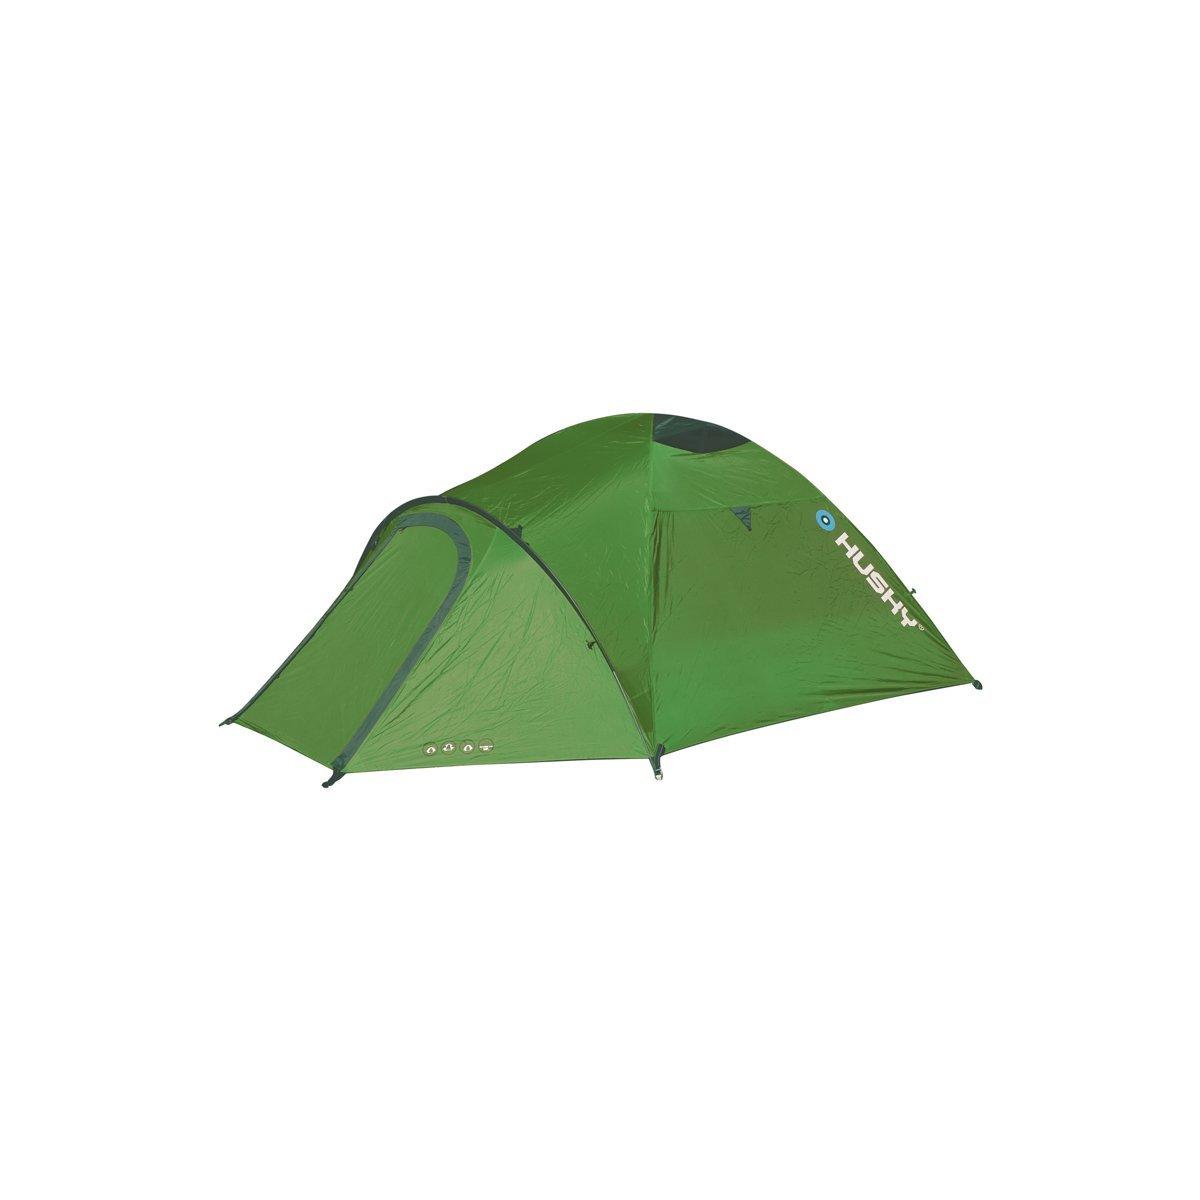 Husky Extreme Lite-Zelt Baron 4 Personen, grün